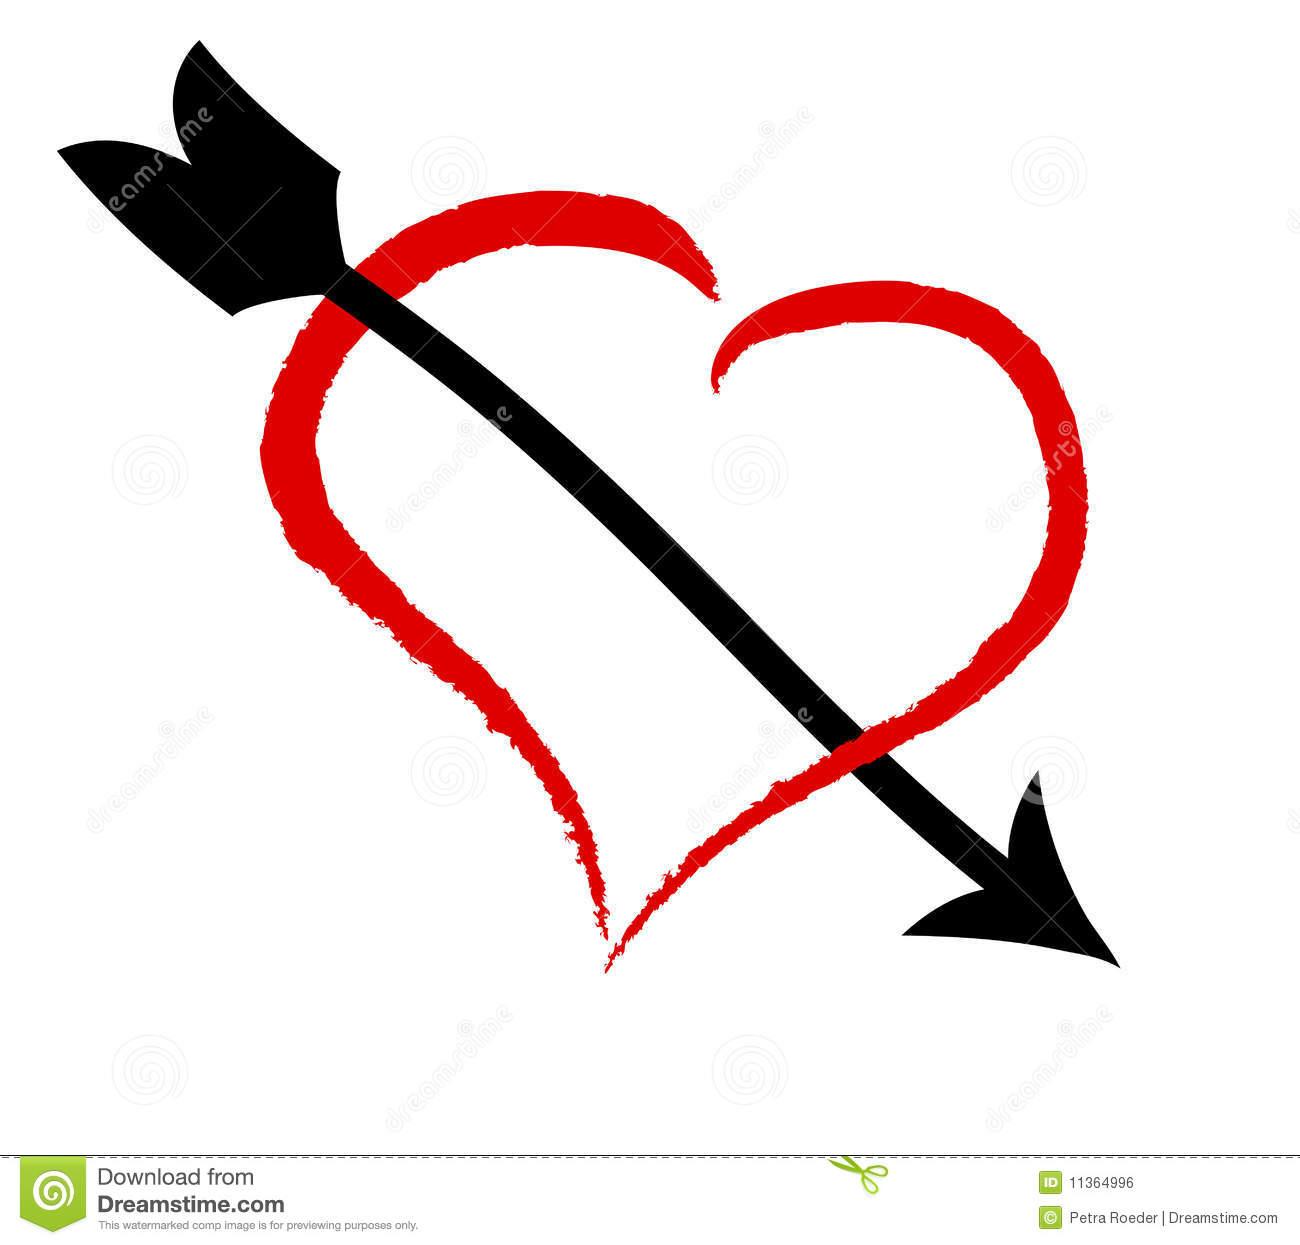 Heart with arrow clipart banner stock Heart With Arrow Royalty Free Stock Image - Image: 11364996 banner stock